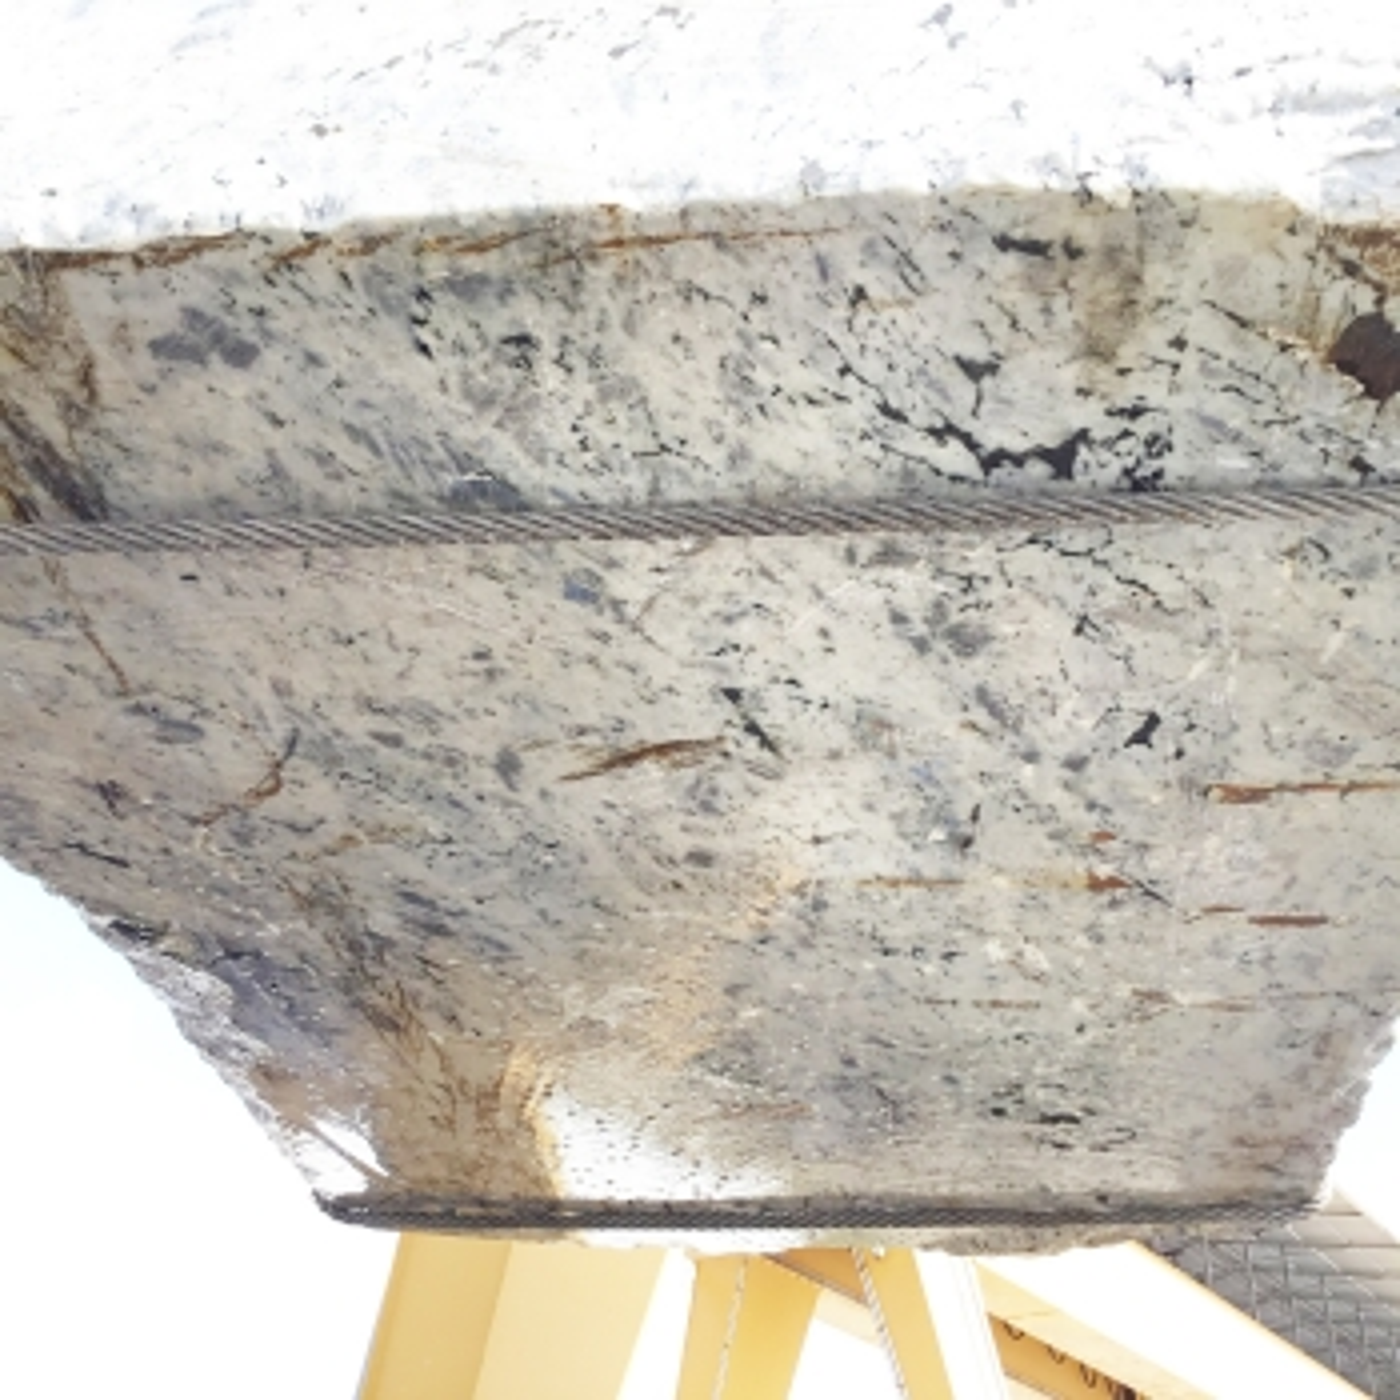 LABRADORITE BIANCA Fourniture Verona (Italie) d' blocs bruts en labradorite naturelle GL D190308 , Face B